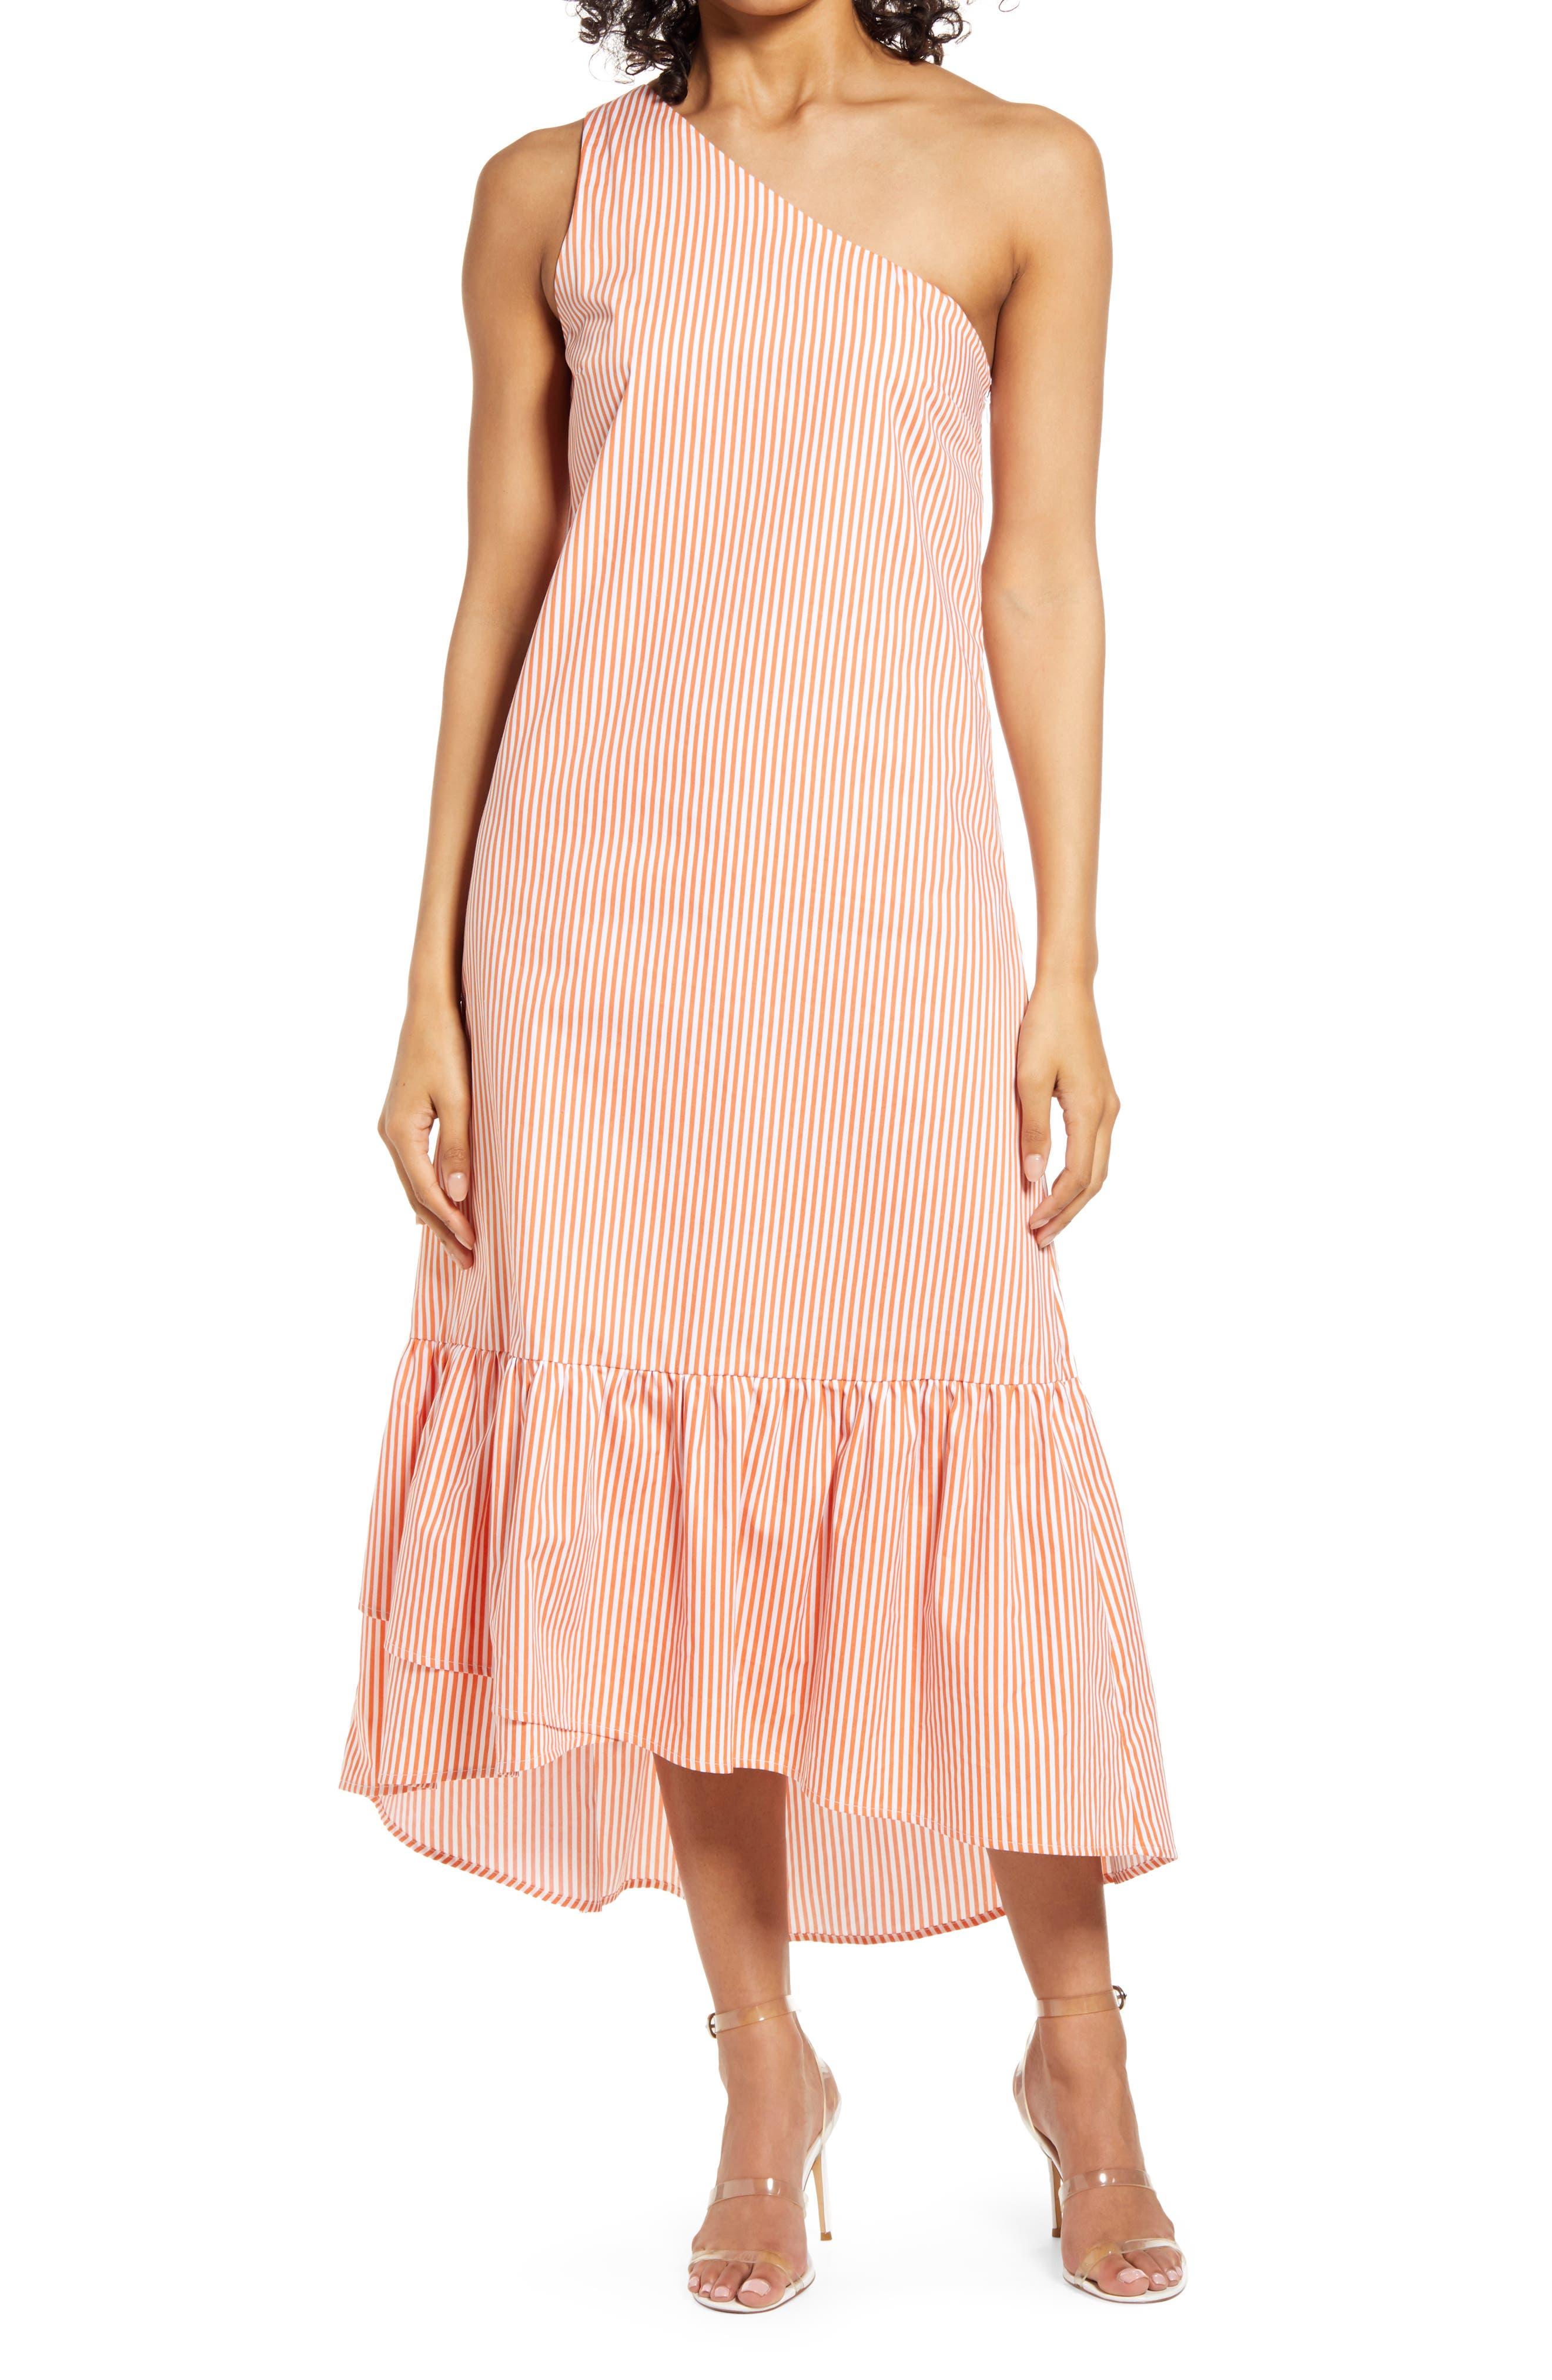 Tiered One-Shoulder Dress